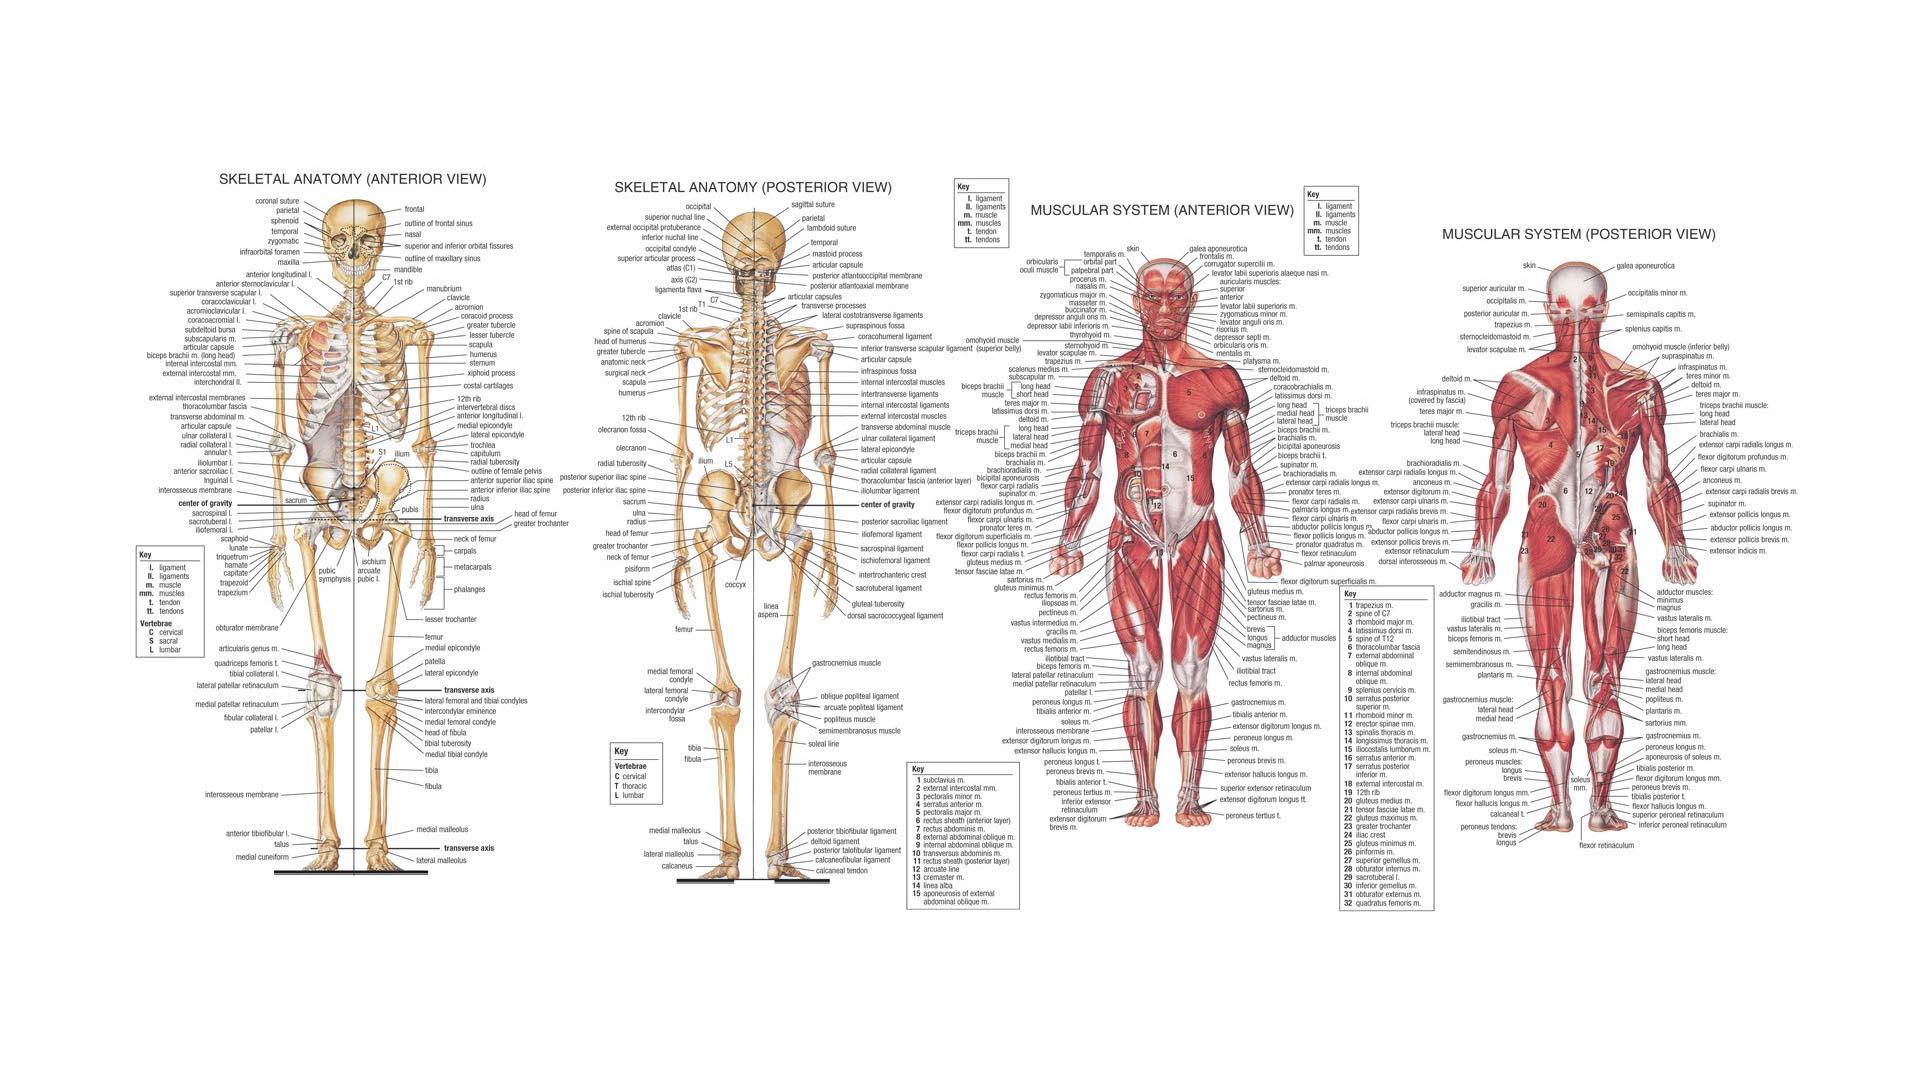 human anatomy back view organs - ModernHeal.com